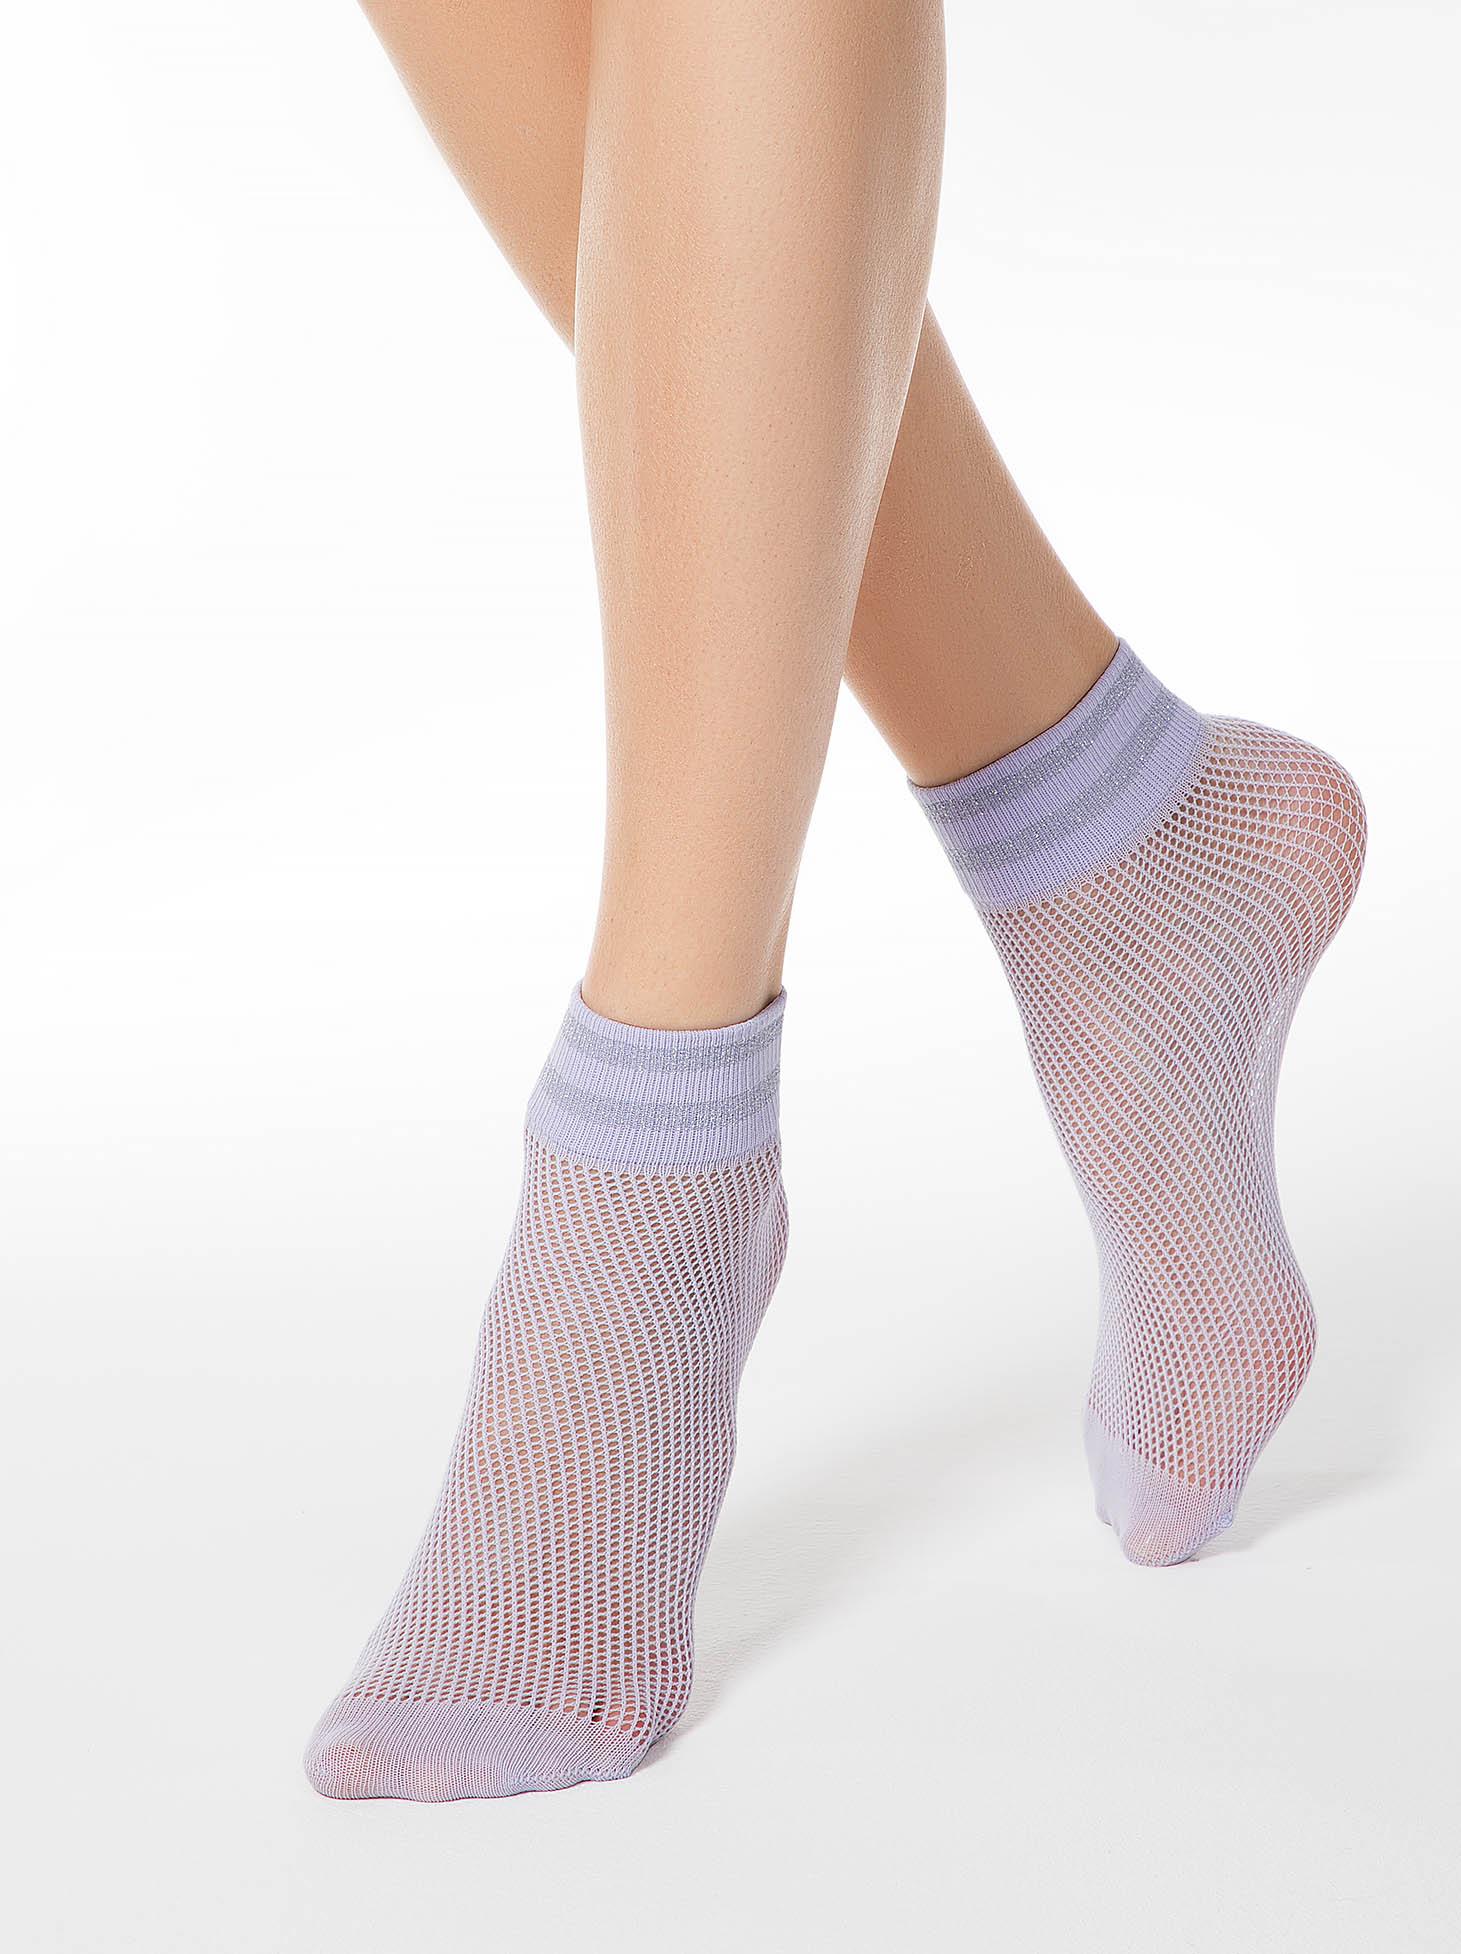 Lila net stockings tights & socks from elastic fabric shimmery metallic fabric